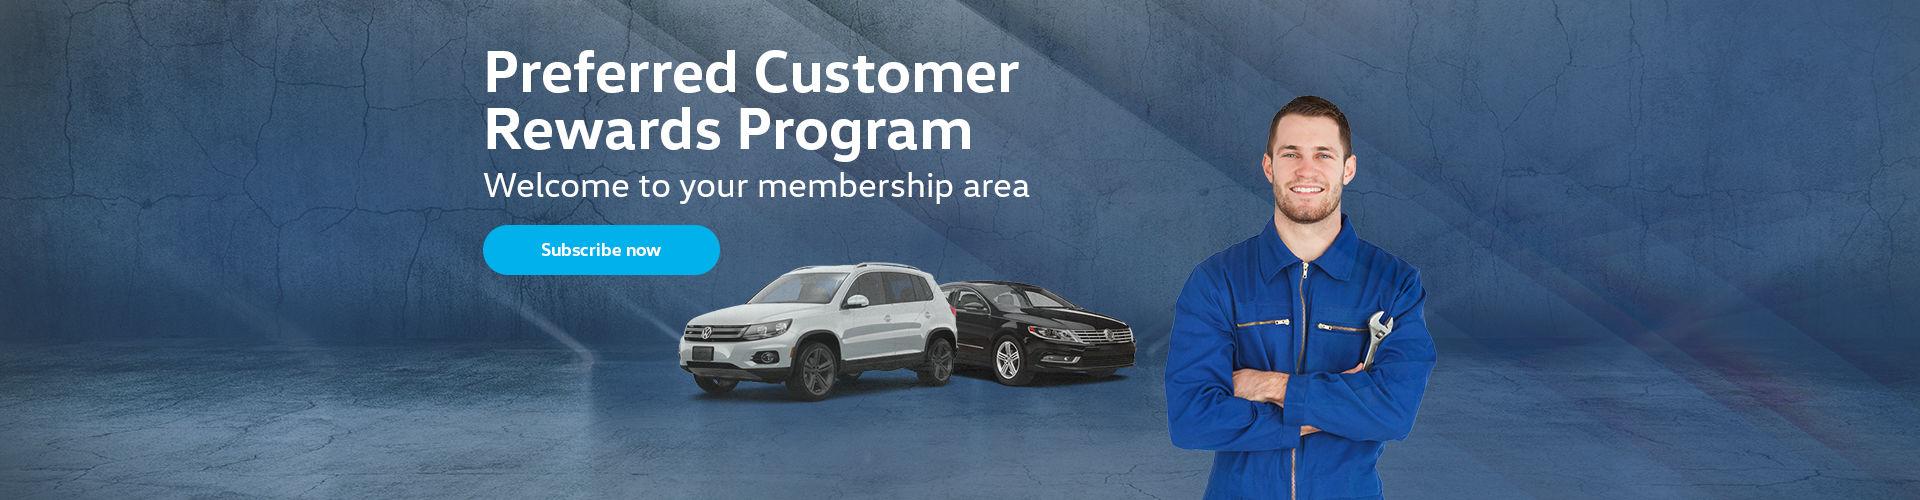 Preferred custom rewards program